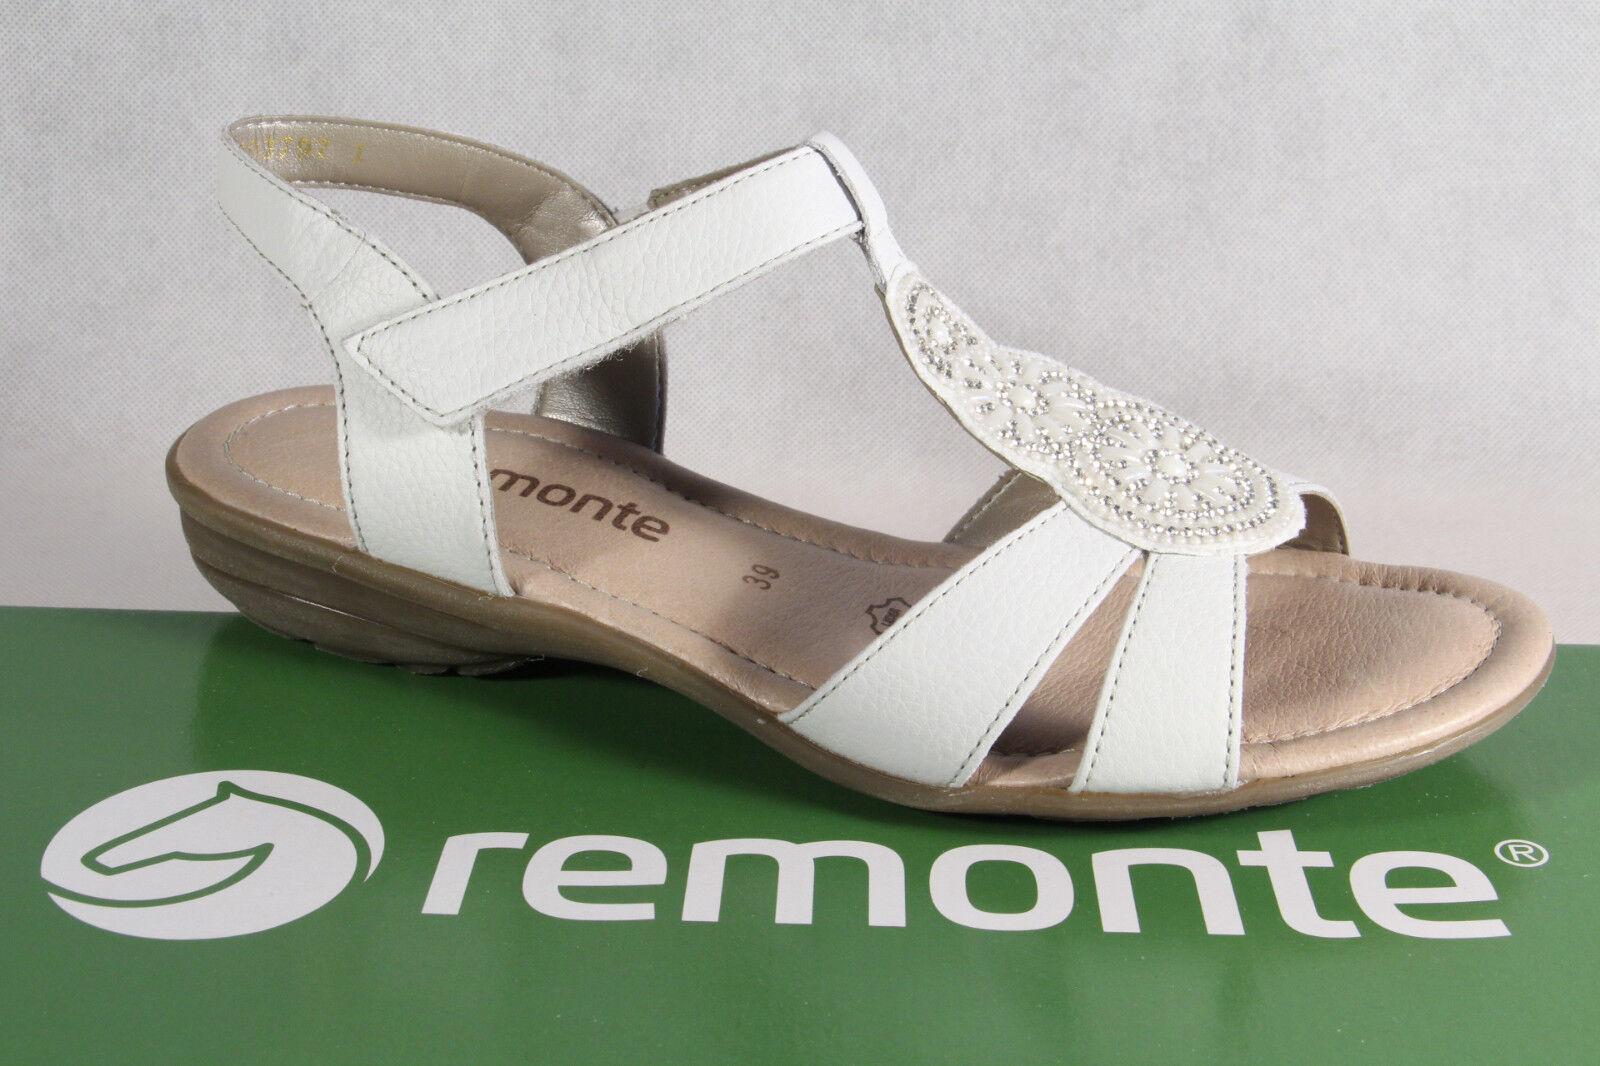 Remonte Sandalee Sandaleetten Sandaleette weiss Lederinnensohle Echtleder NEU